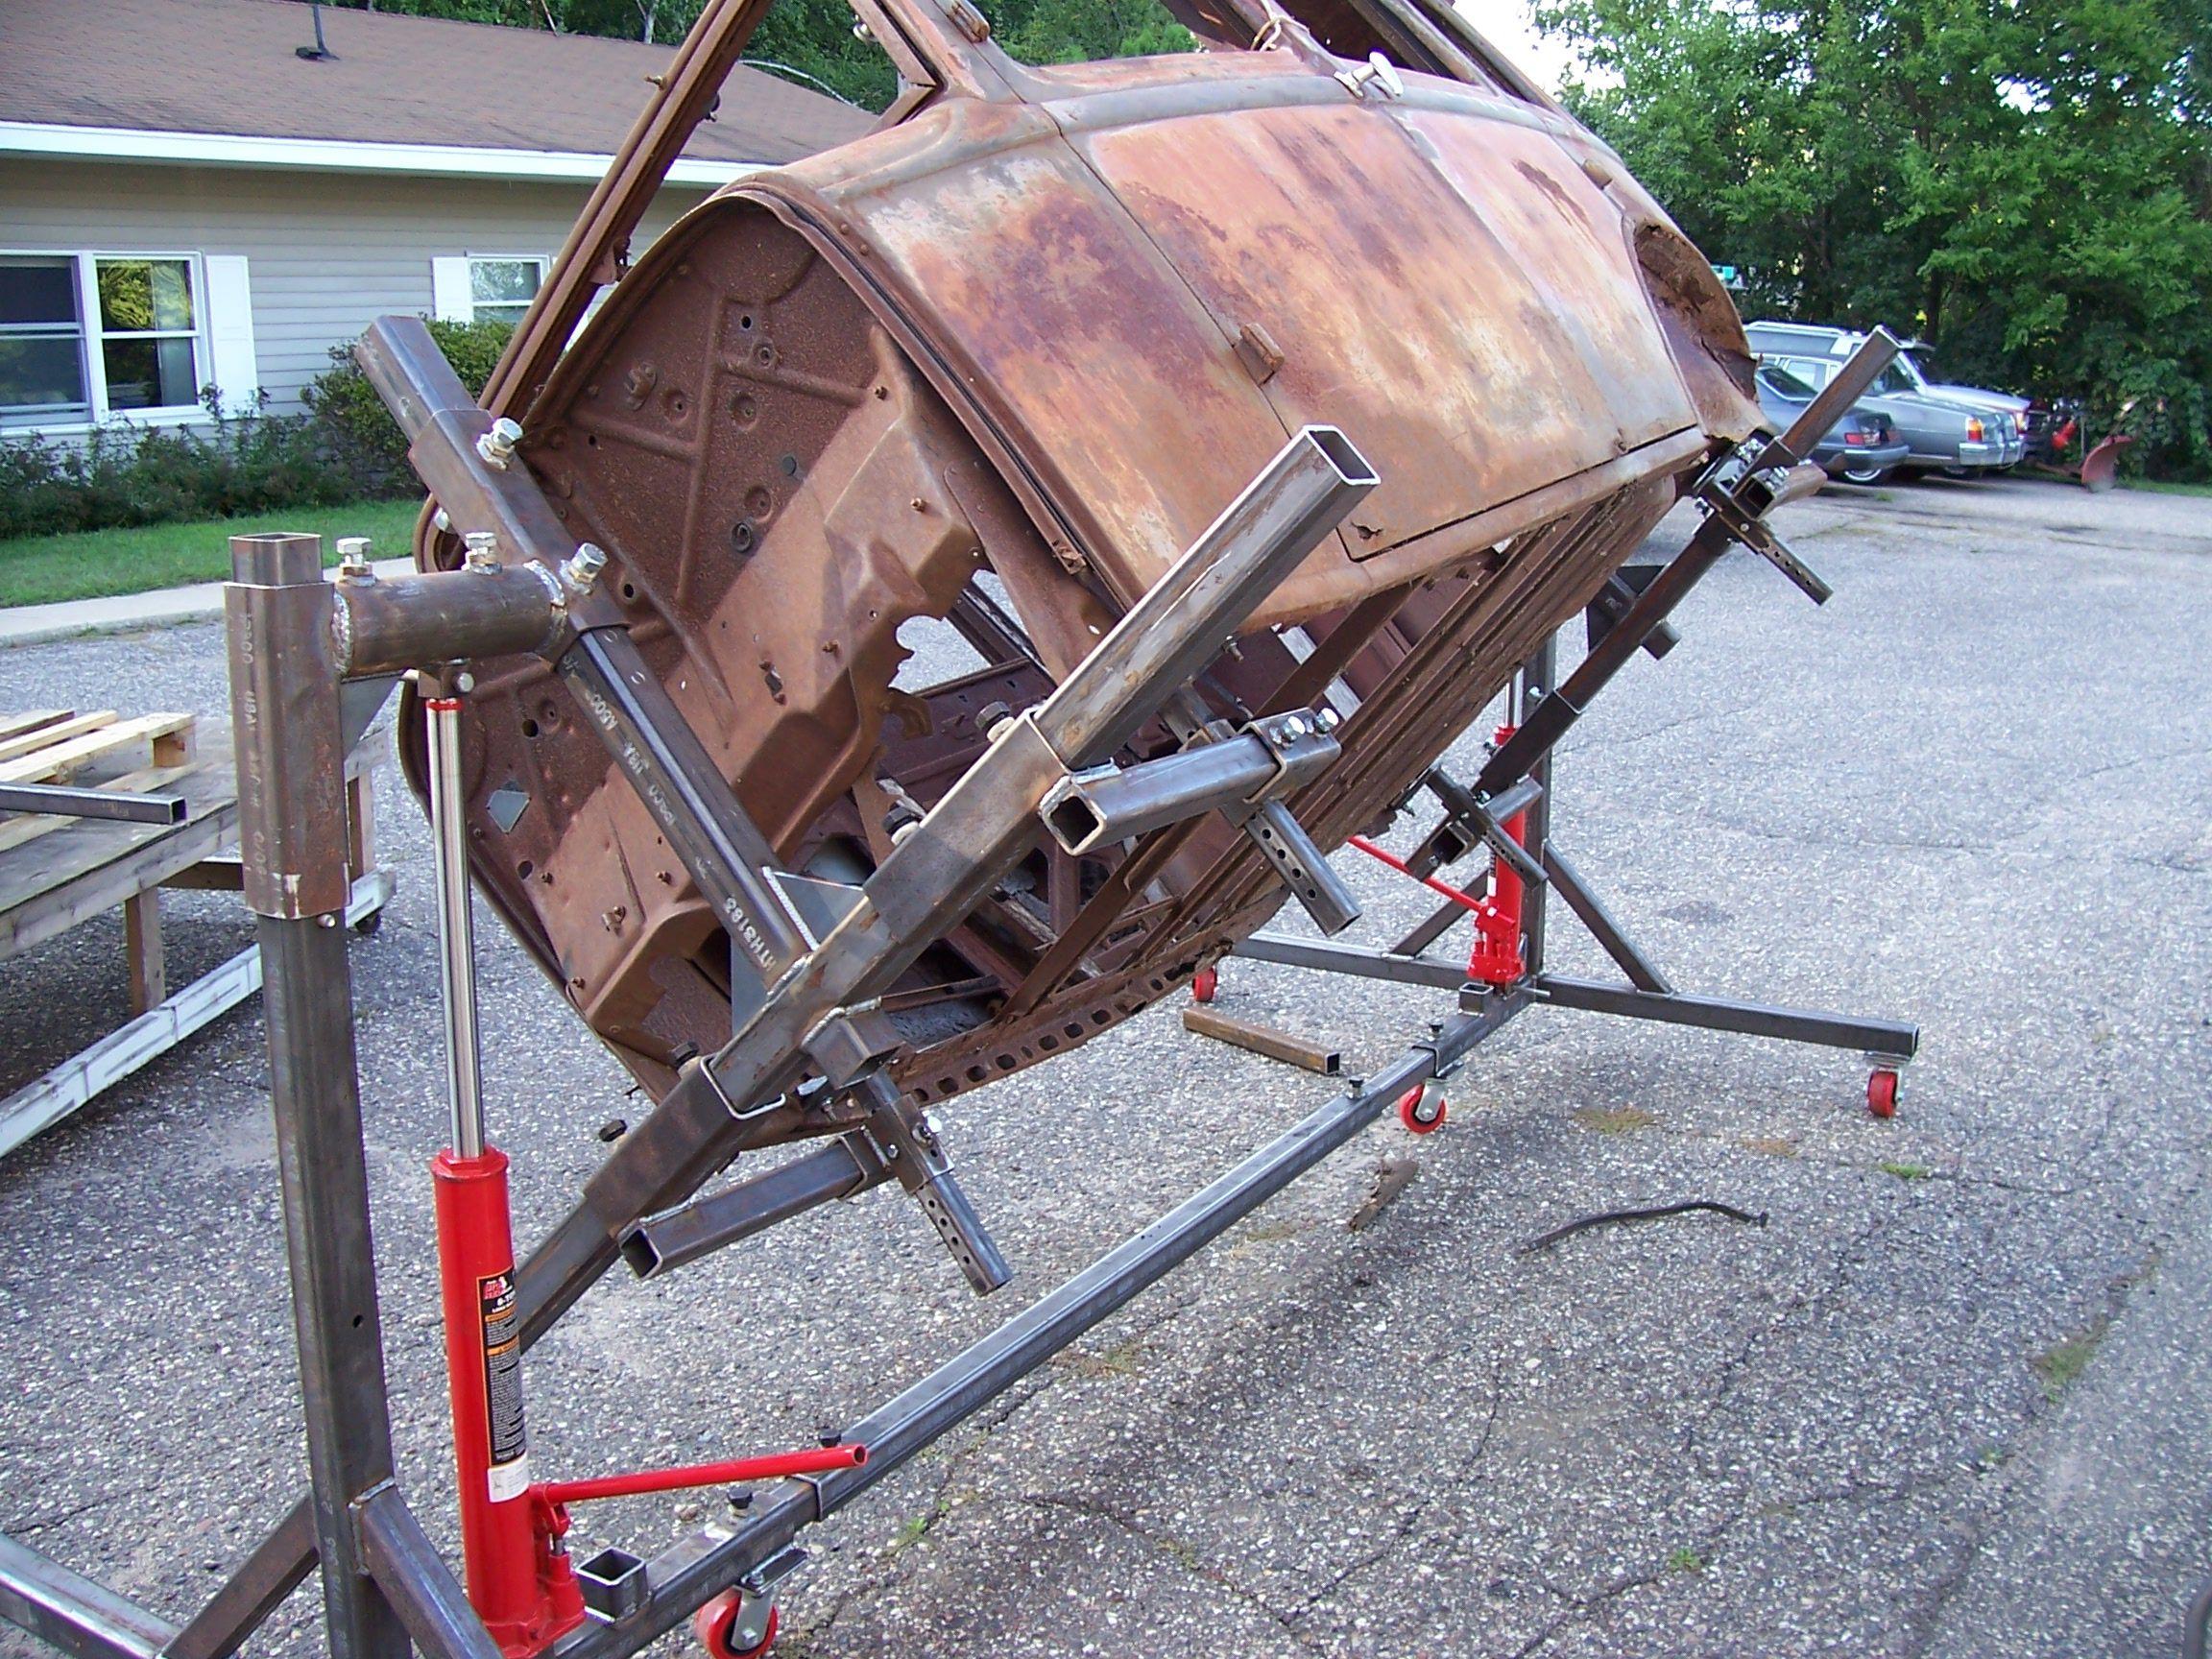 Auto Rotisserie Plans Cars Metals And Garage Workshop